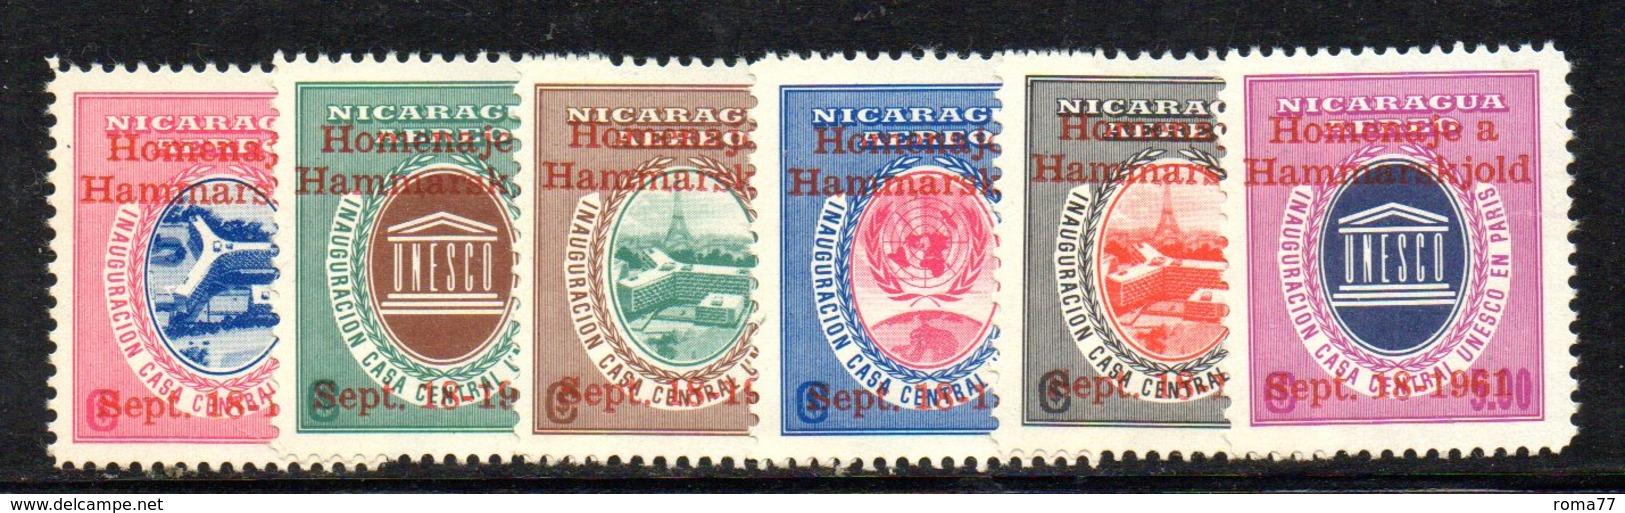 APR1539 - NICARAGUA 1961 , Posta Aerea Serie Yvert N. 465/470  ***  MNH  (2380A) HAMMARSKJOLD - Nicaragua